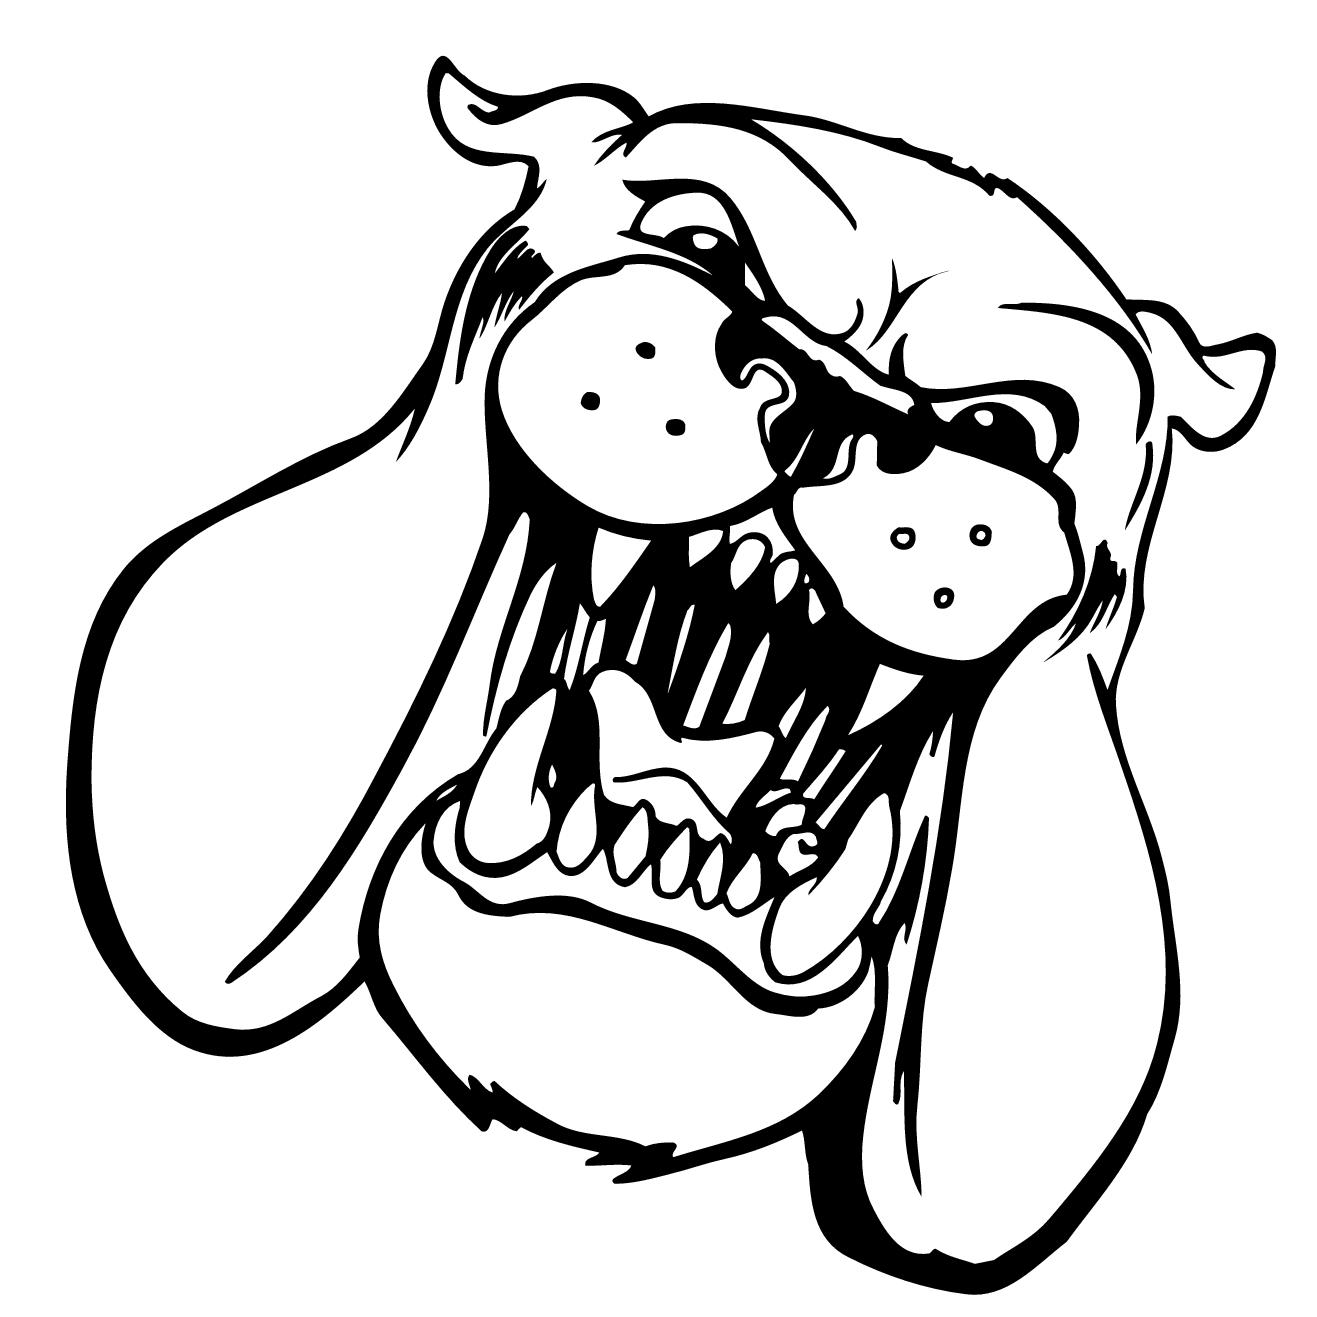 Black clipart bulldog Puppies Free image Bull Pitbull